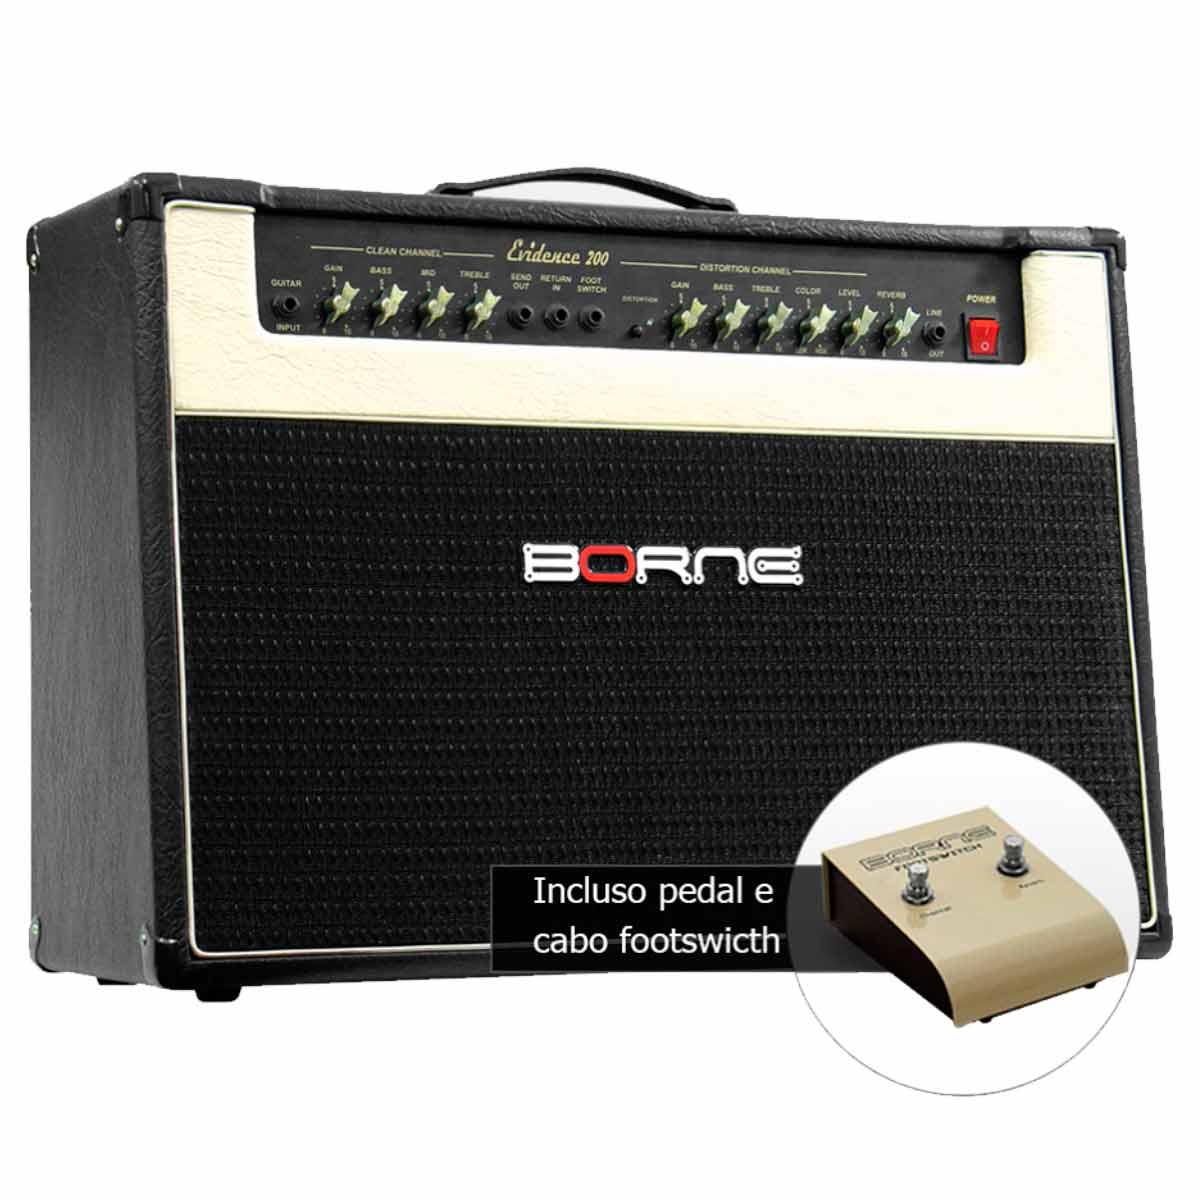 Evidence200 - Amplificador Combo p/ Guitarra 150W Evidence 200 Preto - Borne